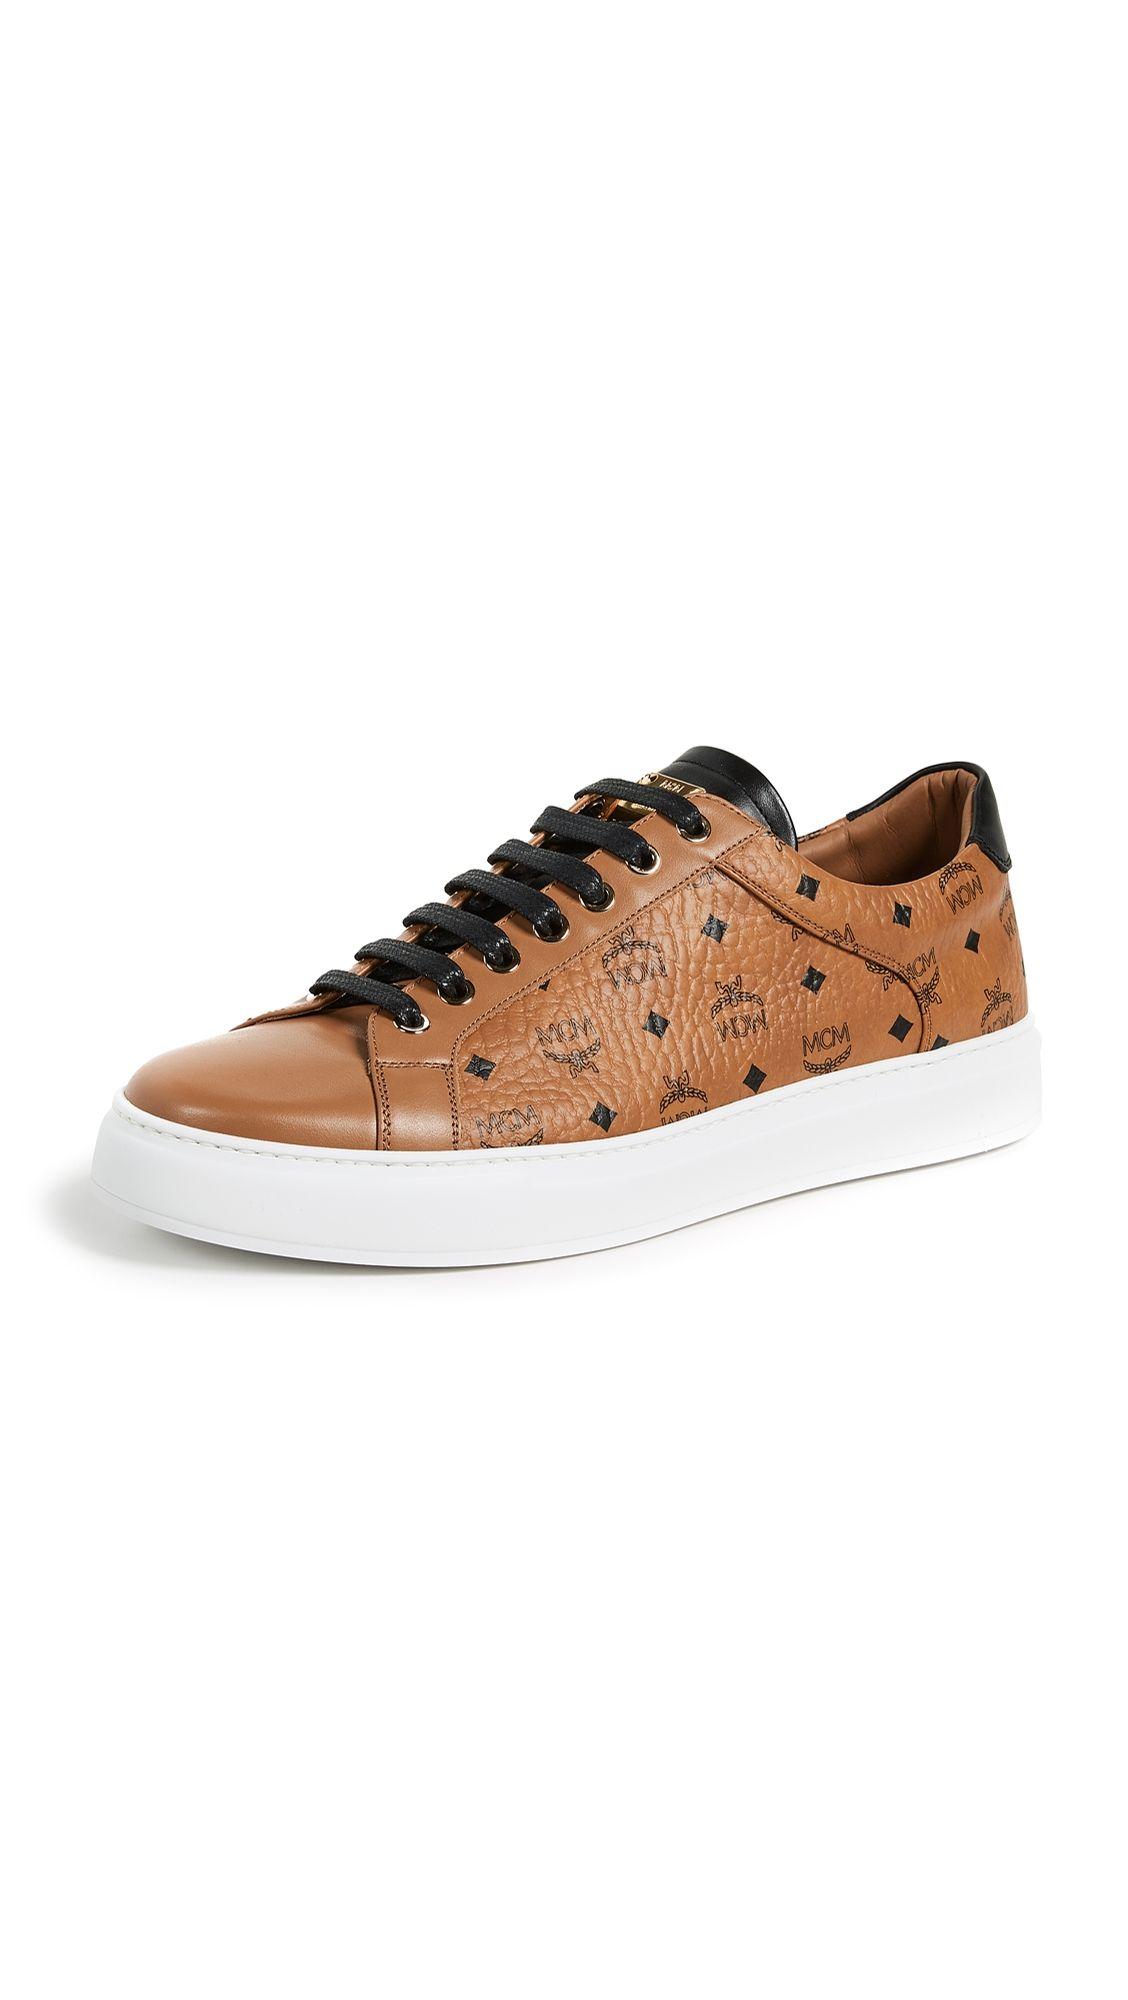 Mcm sneakers, Mcm shoes